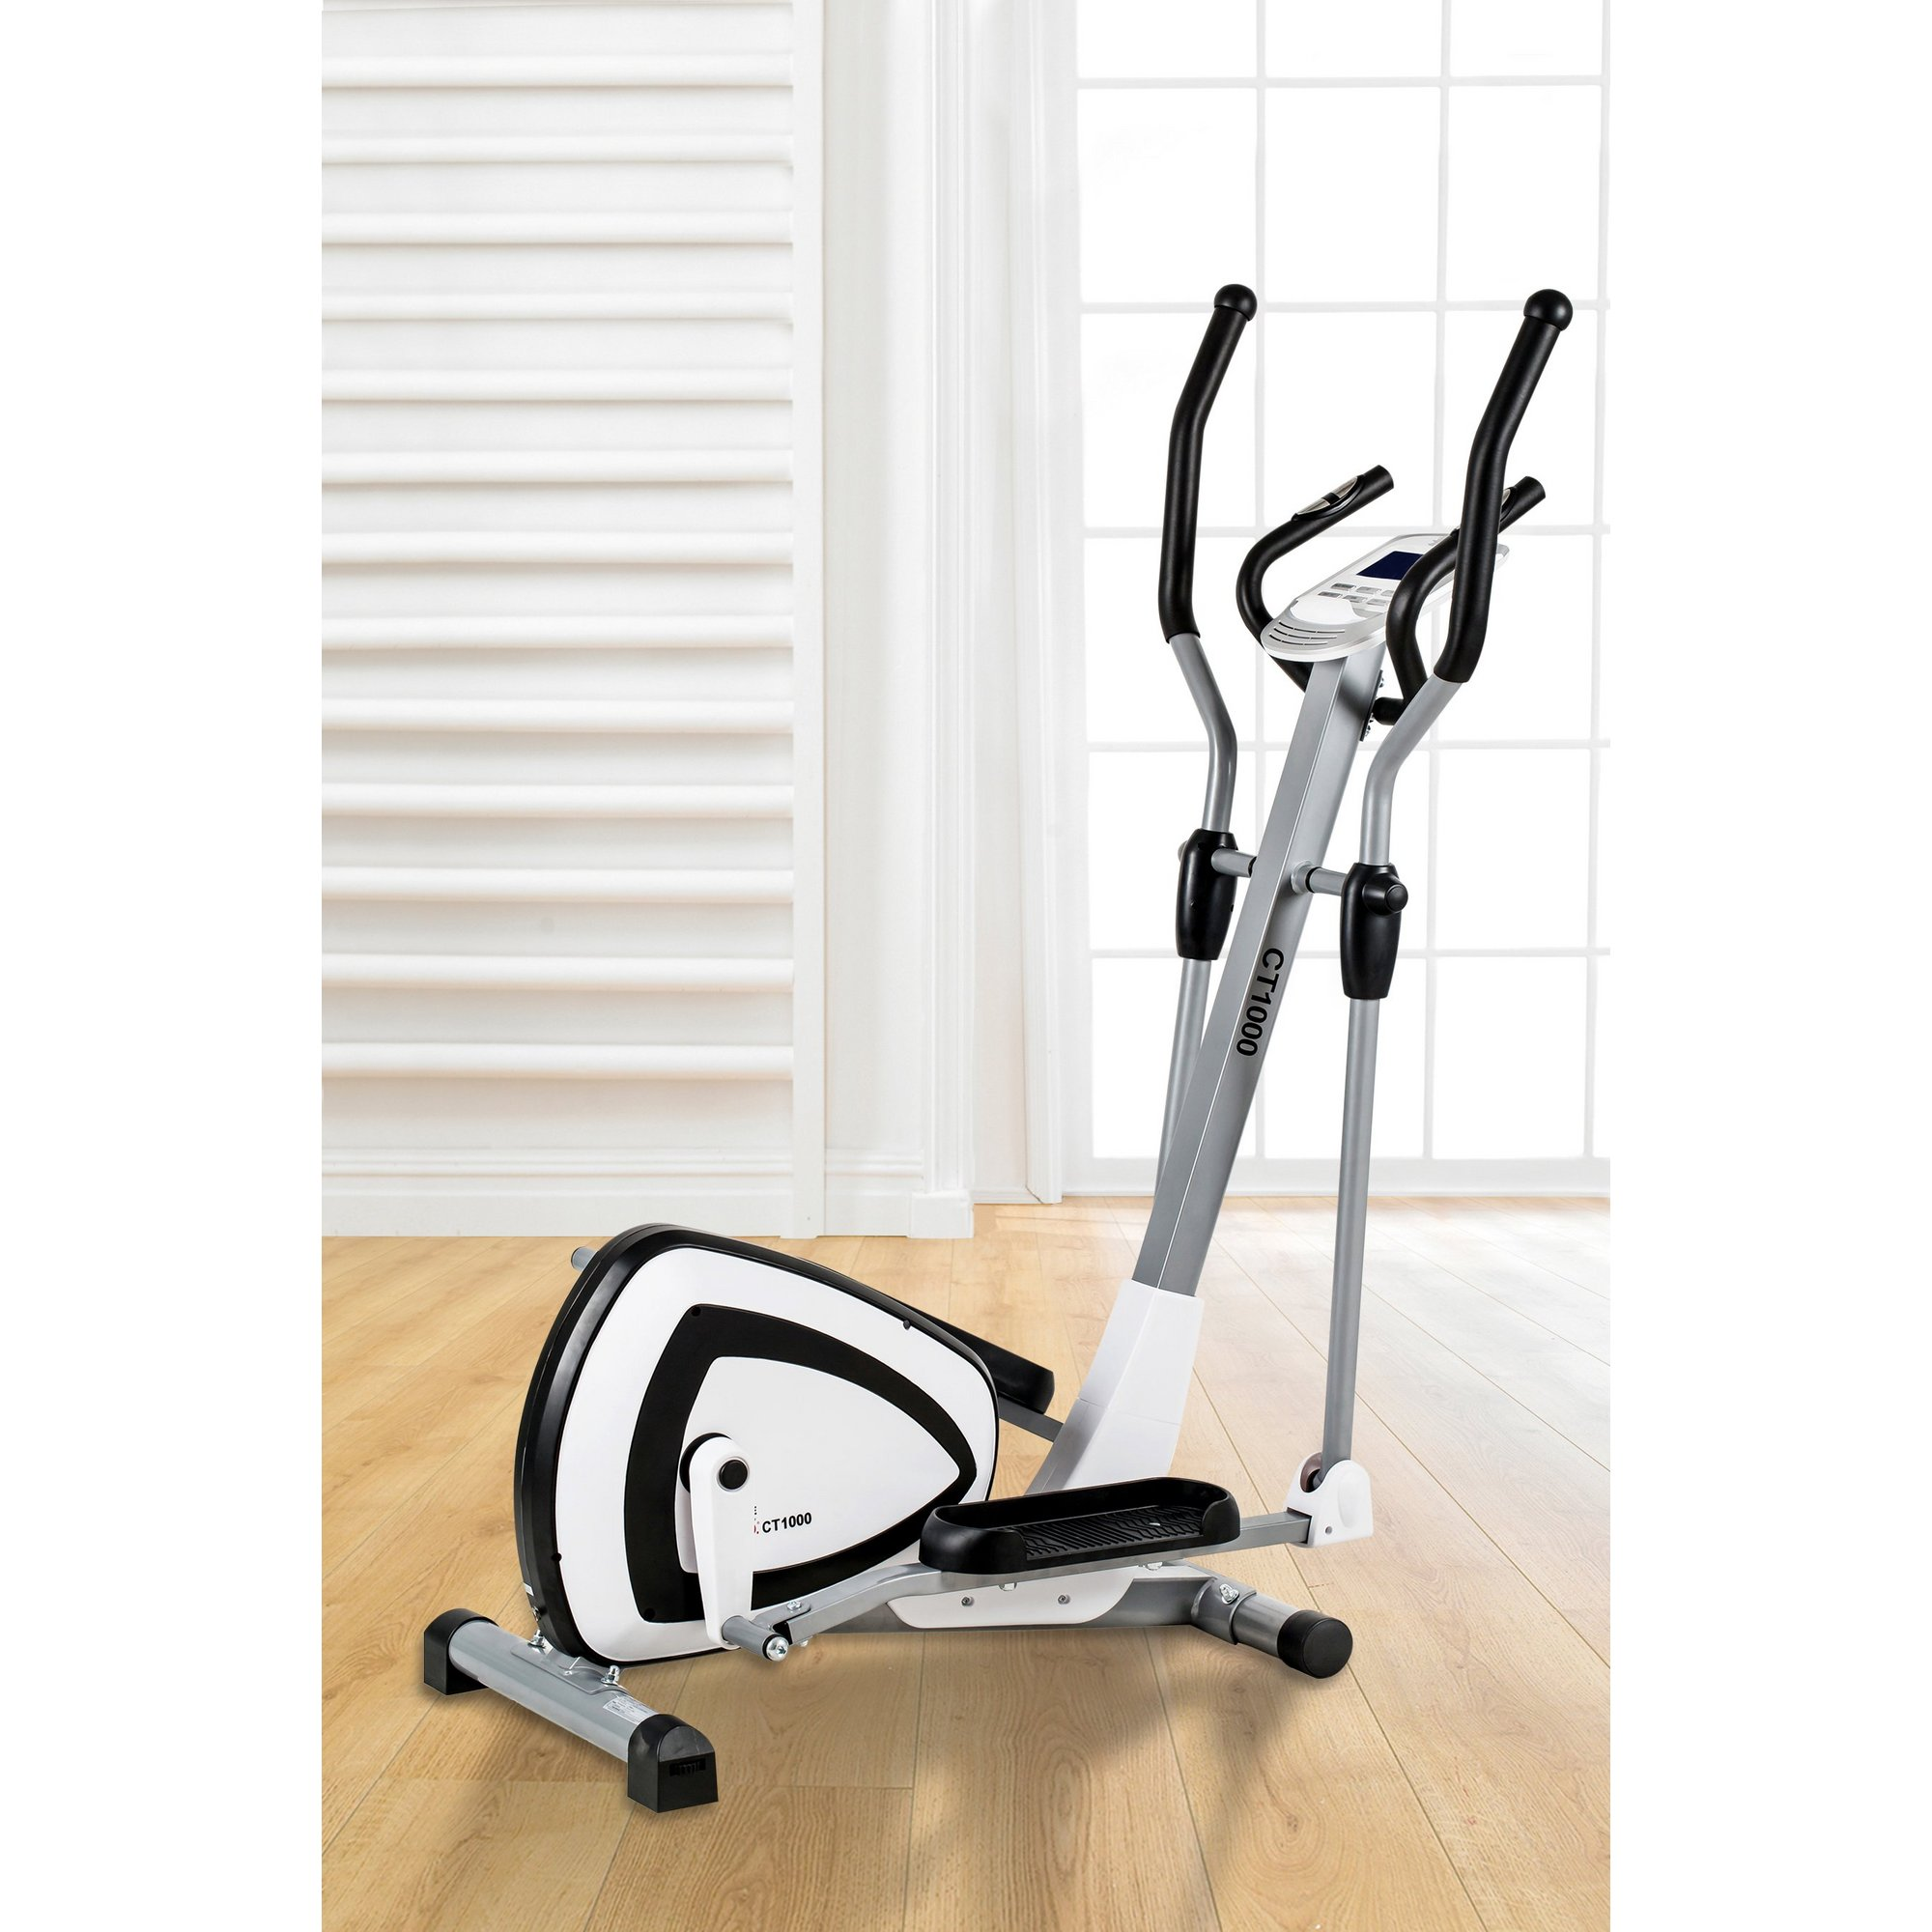 Image of Motive Fitness By Uno CT1000 Ergometer Crosstrainer